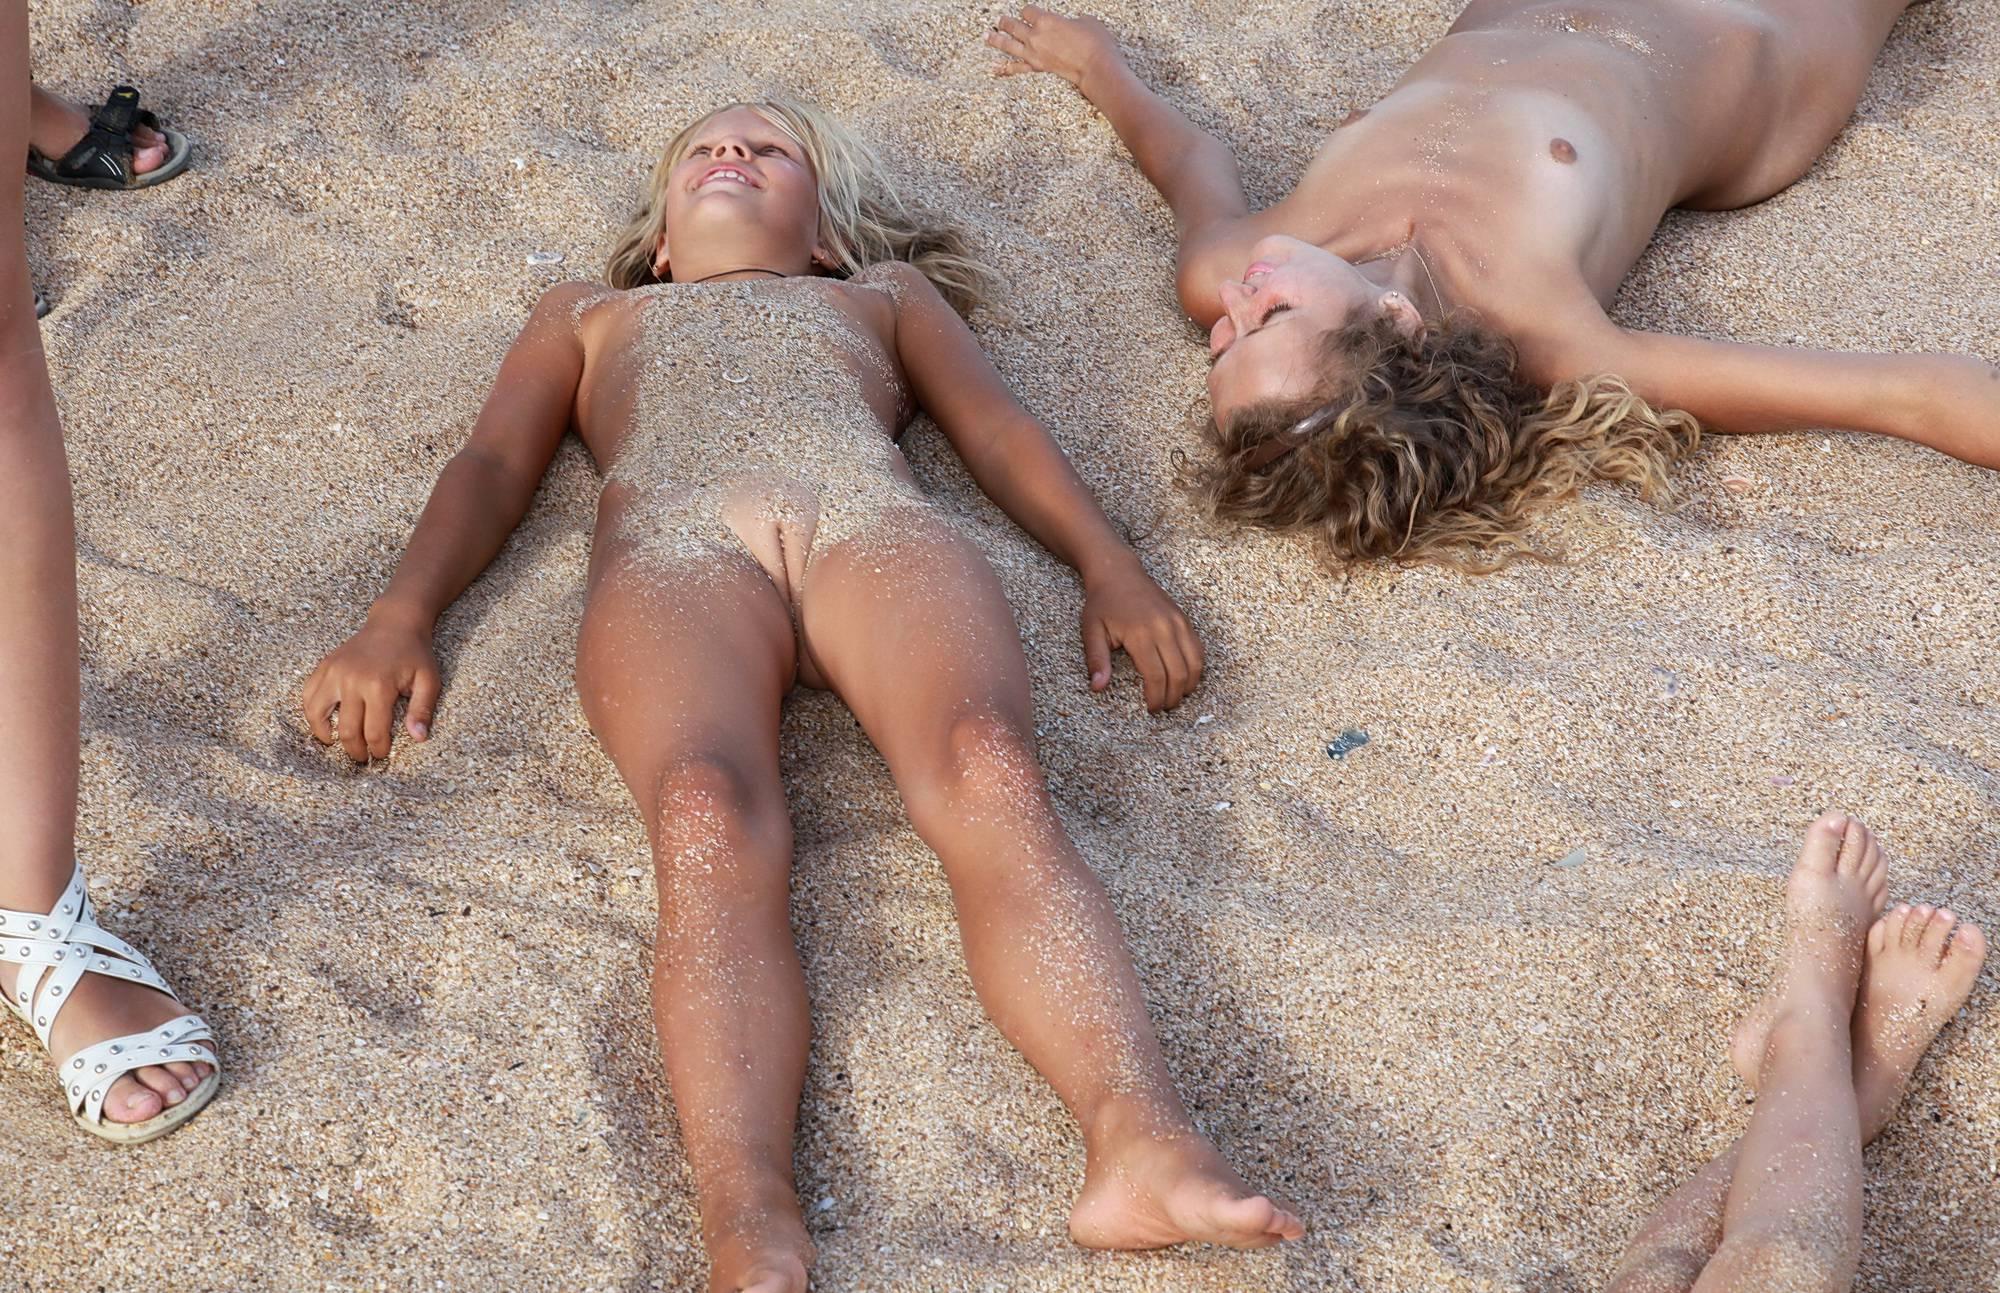 Pure Nudism Photos Sandy Beach On Our Backs - 2